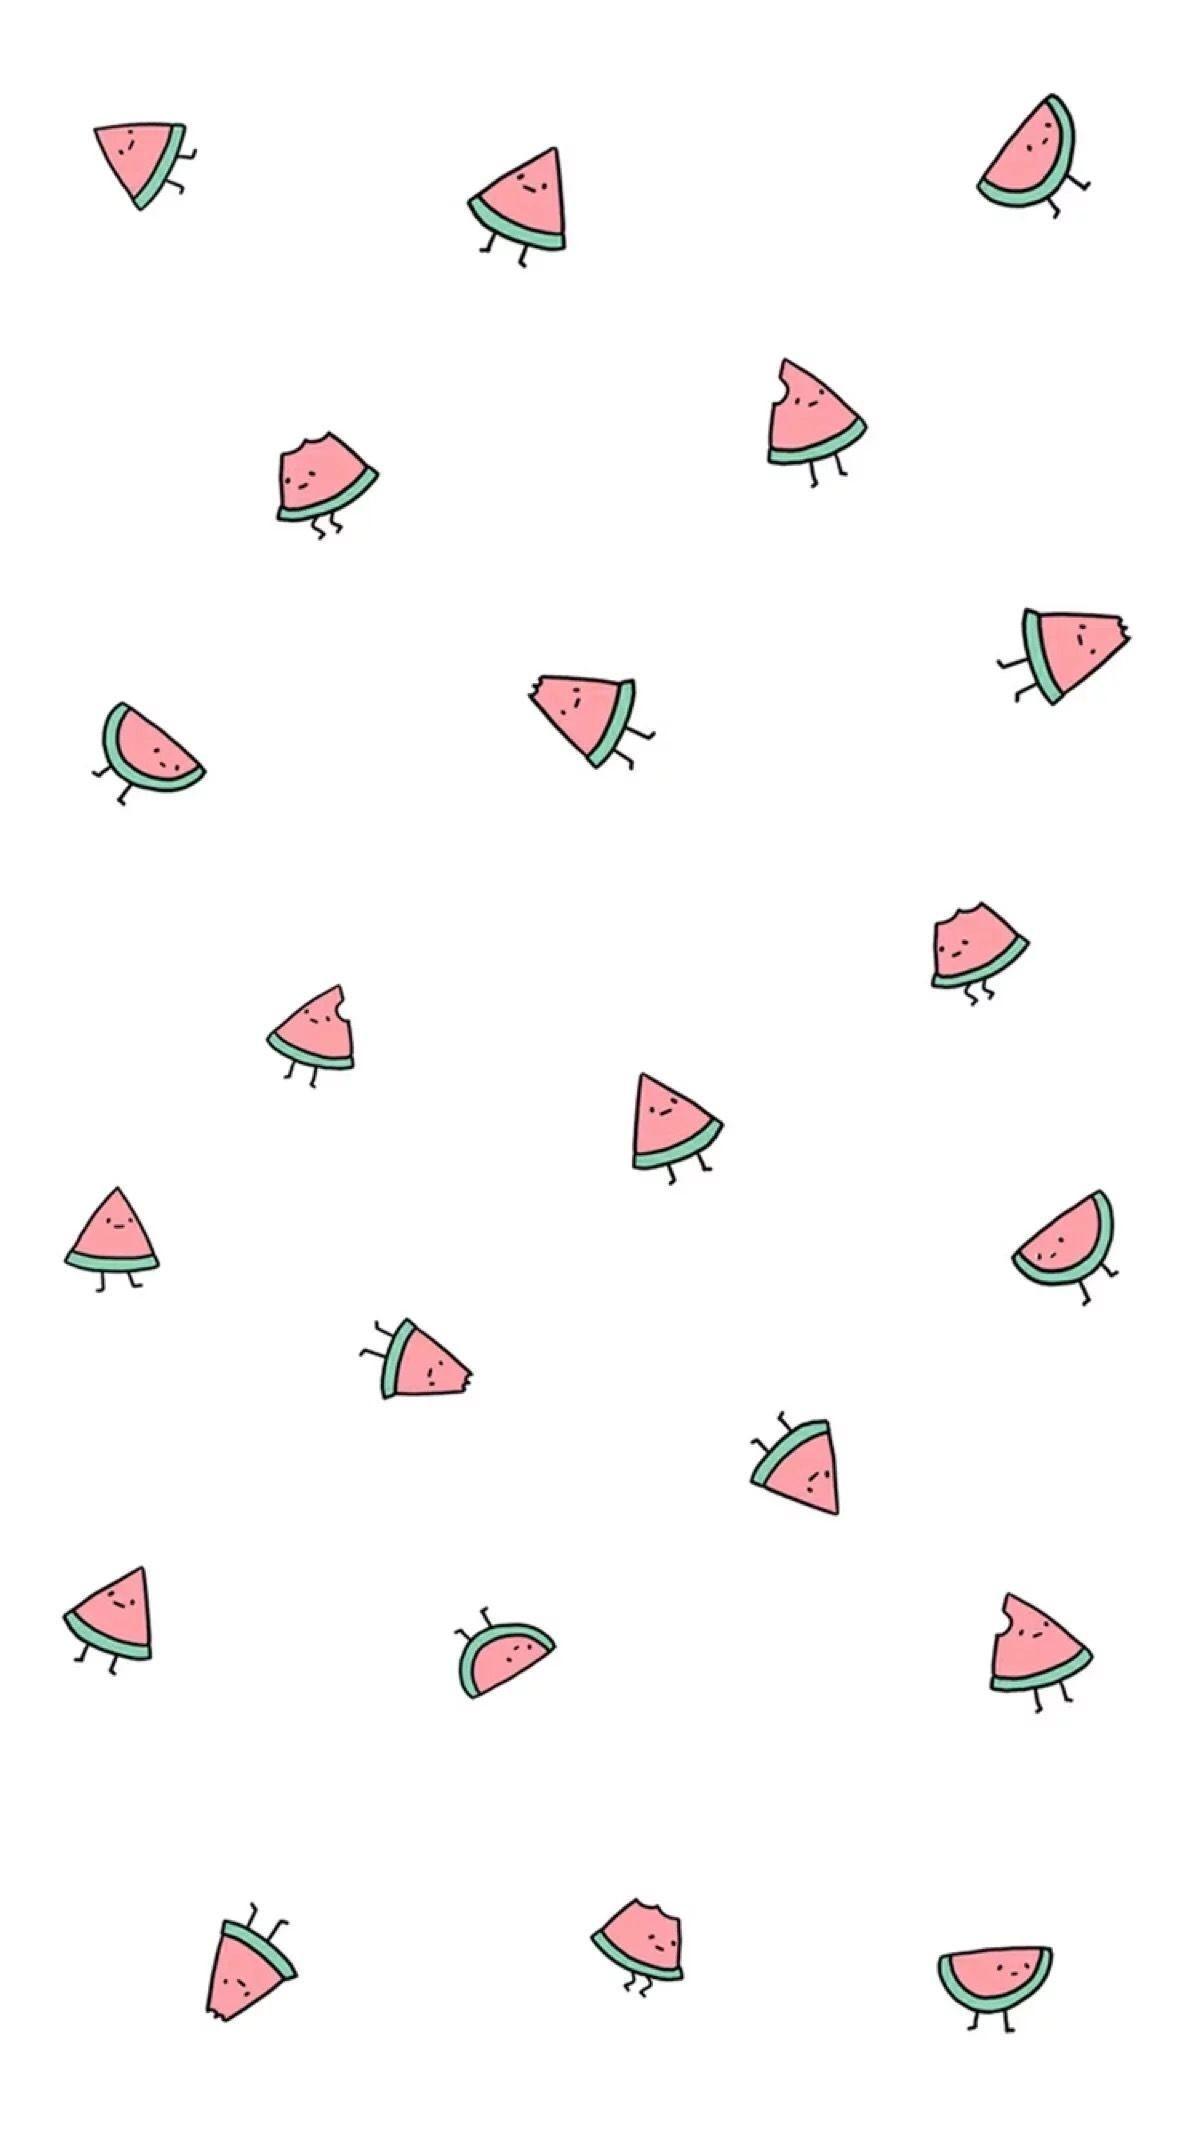 Pin by Lyng on wallpaper Pinterest